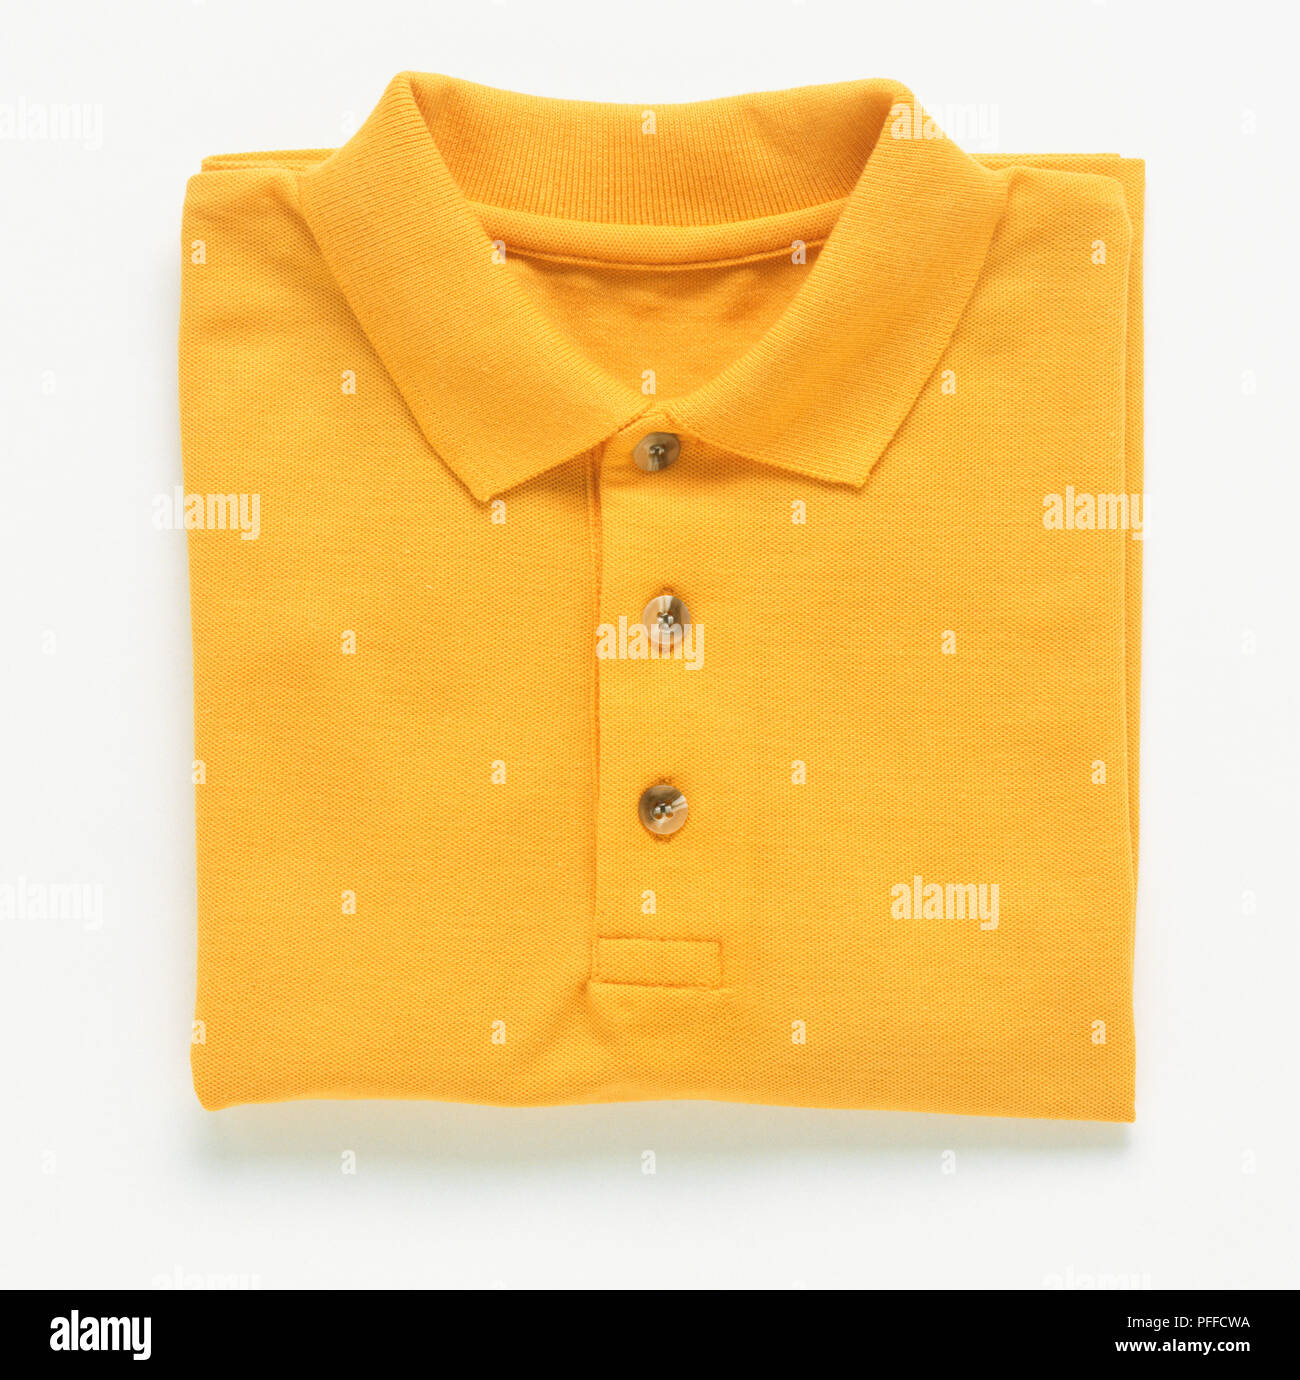 Folded yellow t-shirt. - Stock Image